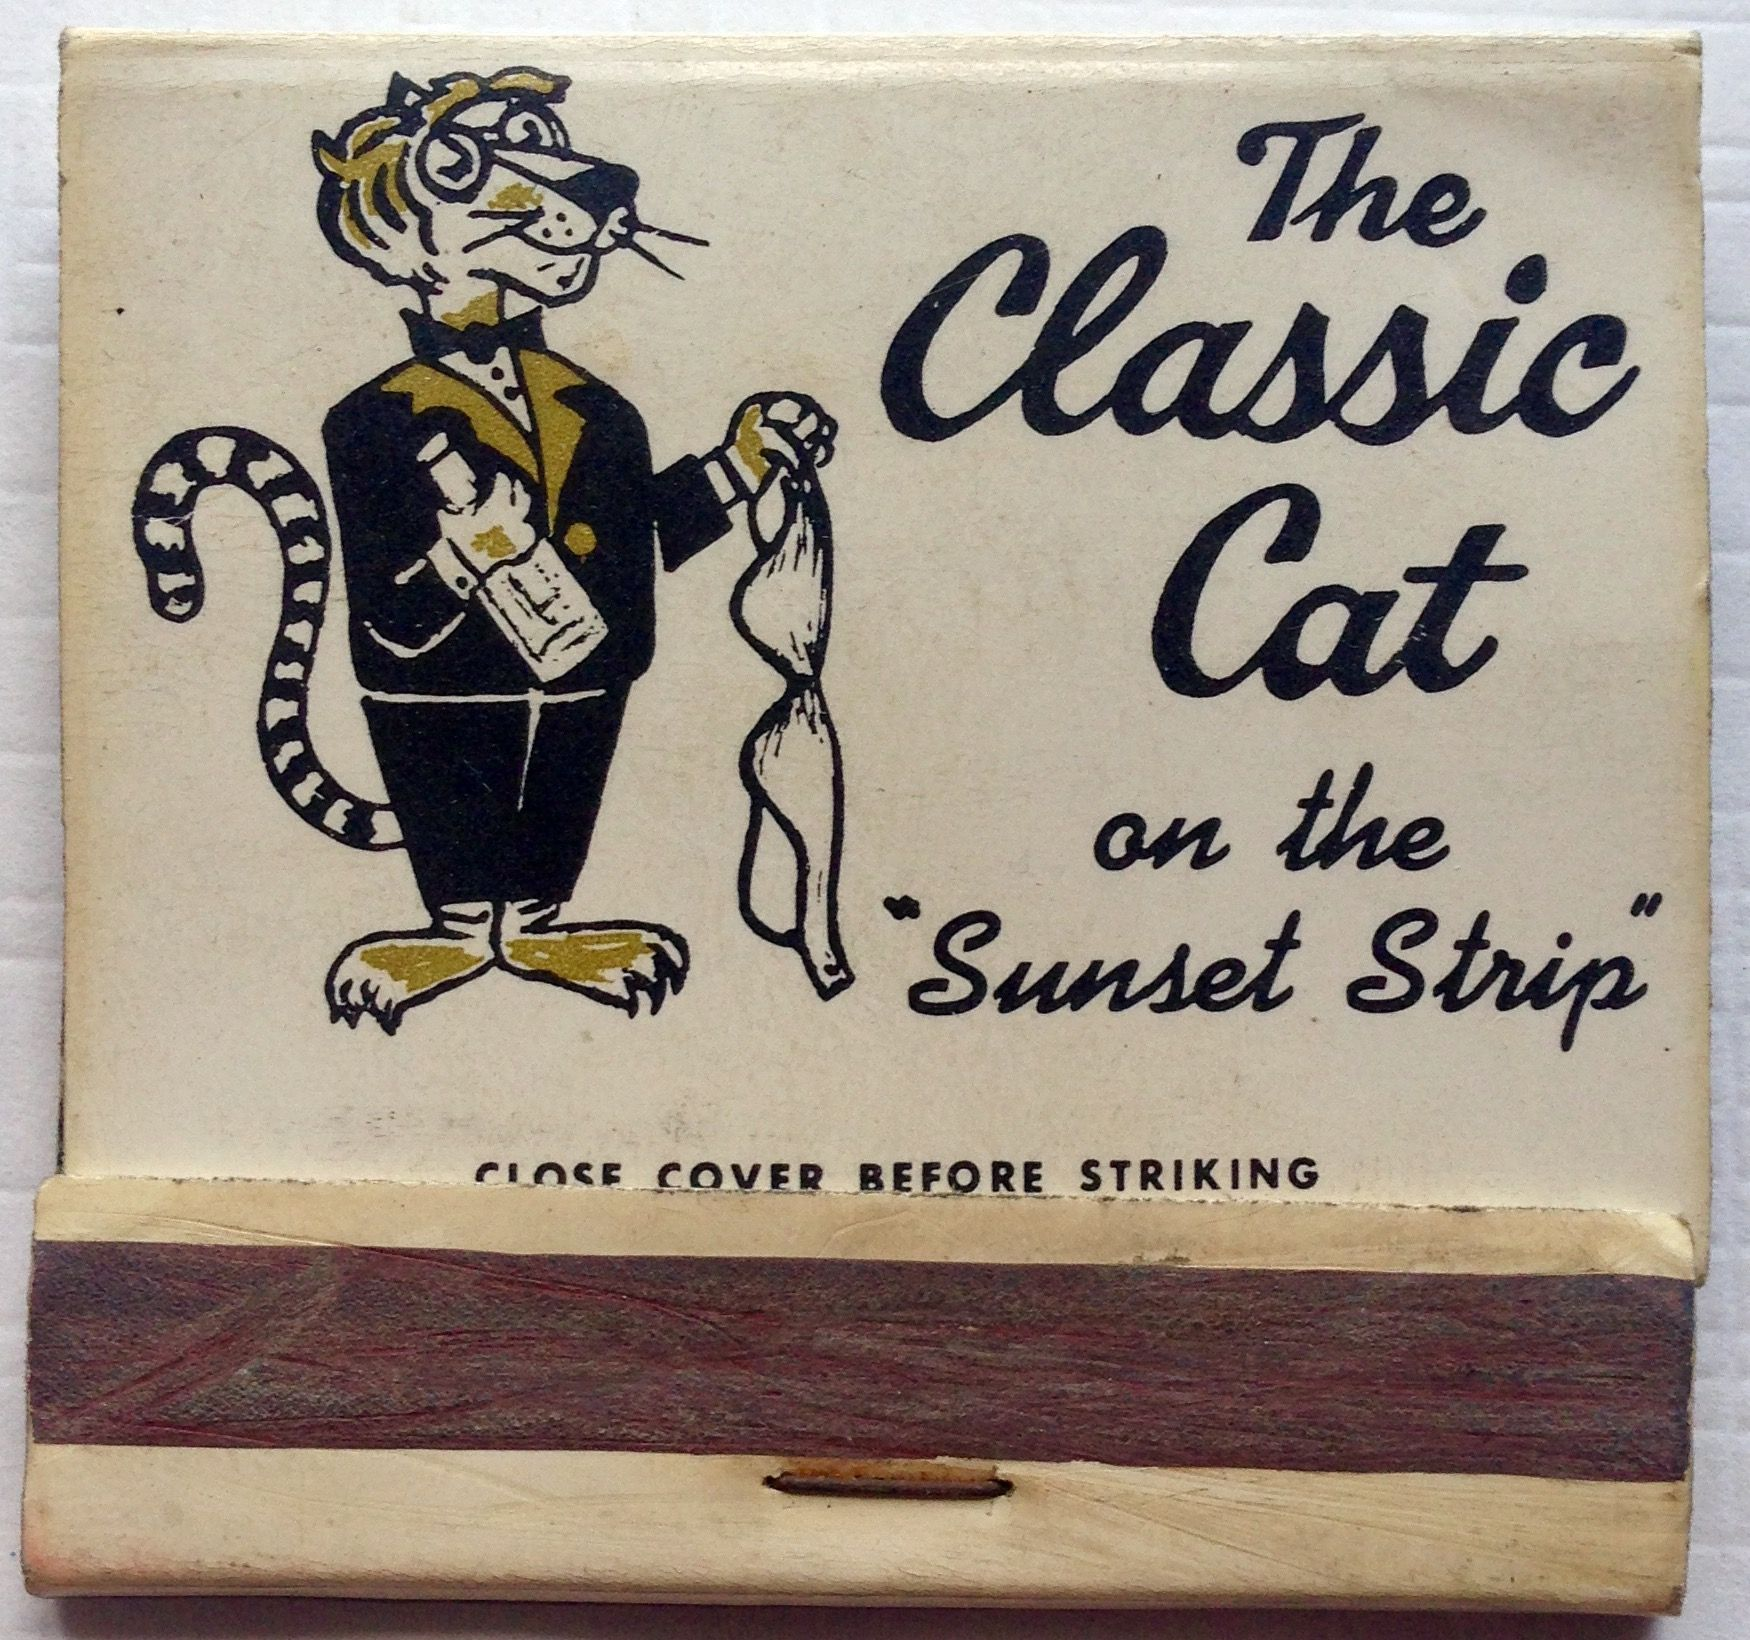 The Classic Cat #sunsetstrip #stripclub #nudie #CA #matchbook - To ...